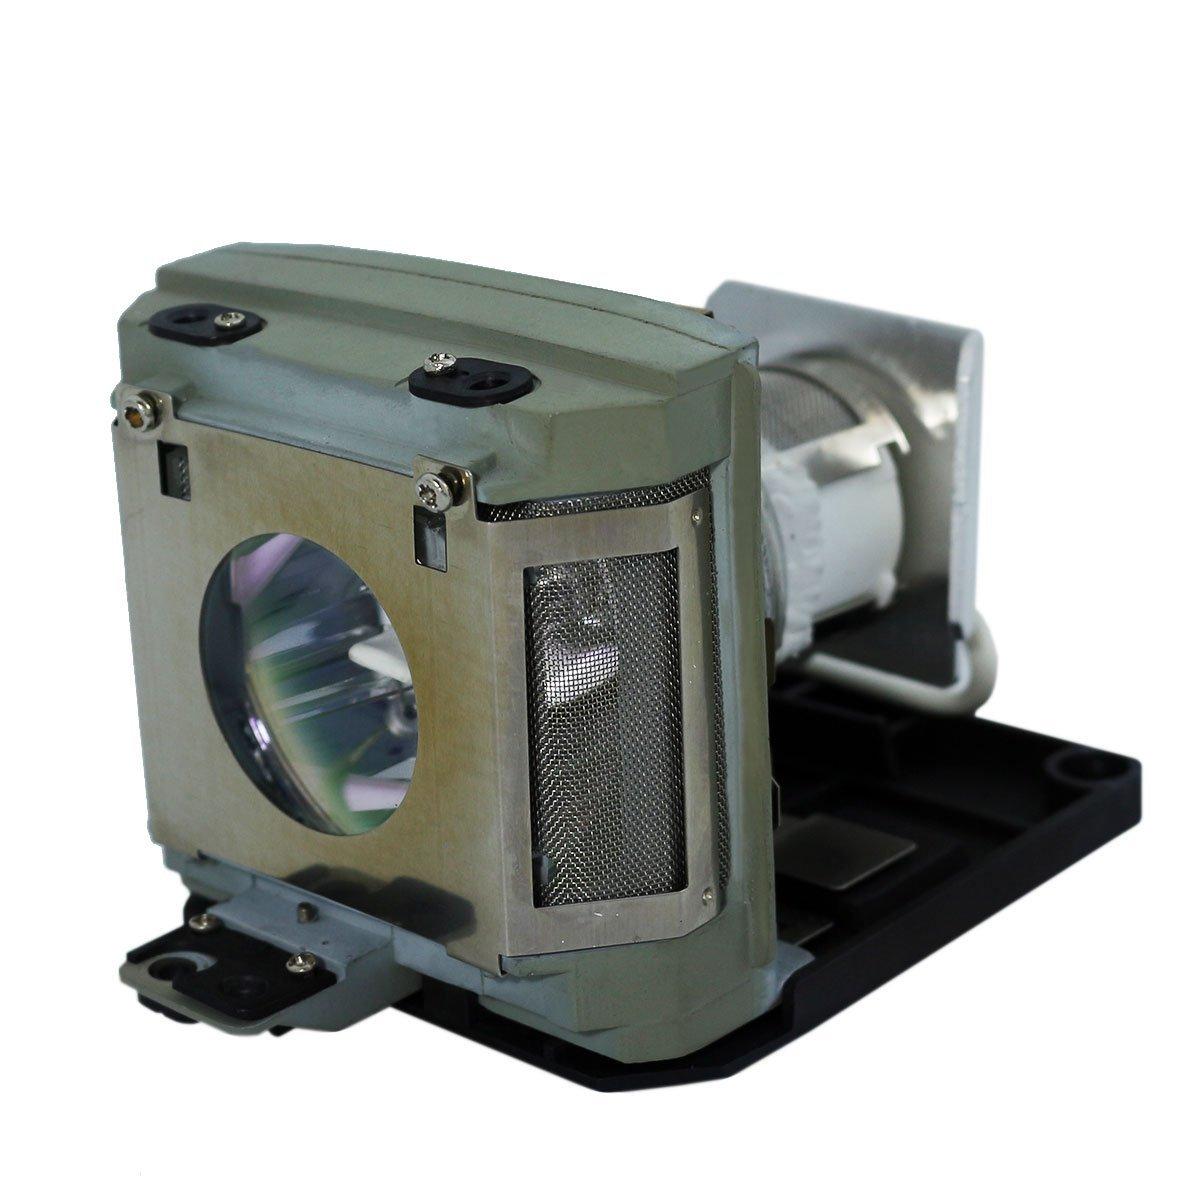 все цены на Projector Lamp Bulb AN-MB70LP ANMB70LP MB70LP for SHARP XG-MB70X XGMB70X with housing онлайн